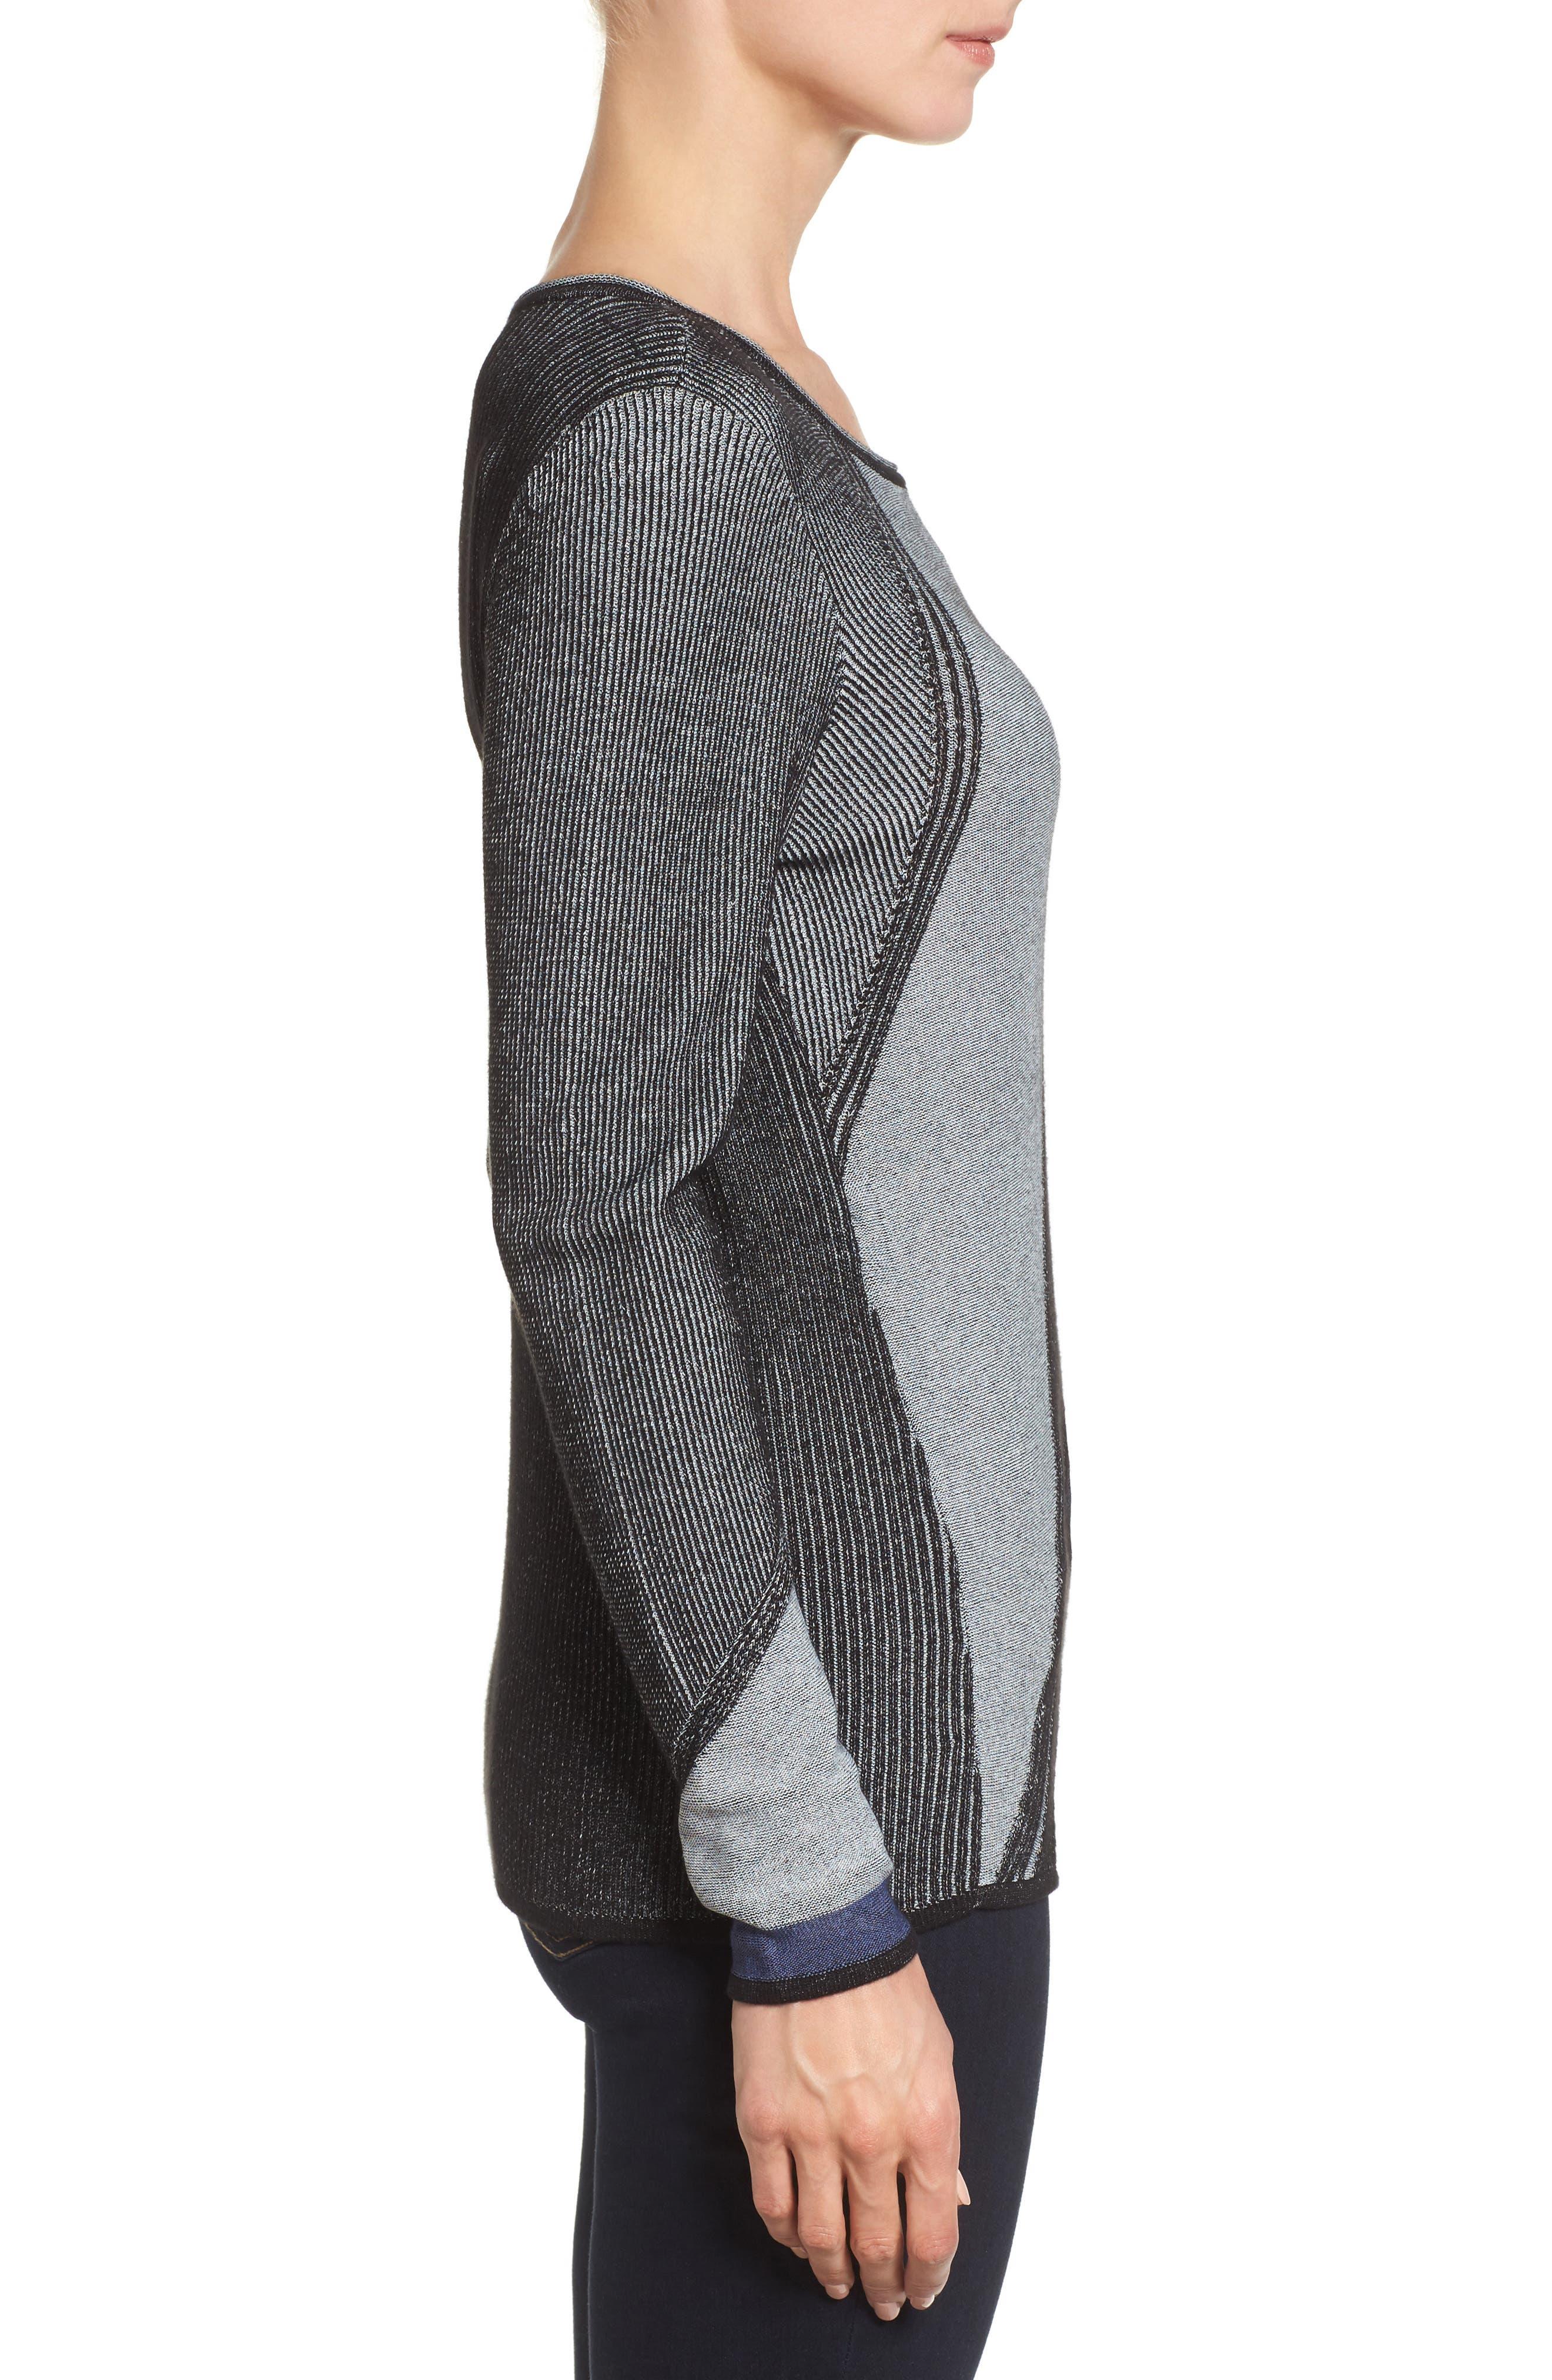 Blue Horizon Knit Top,                             Alternate thumbnail 3, color,                             499